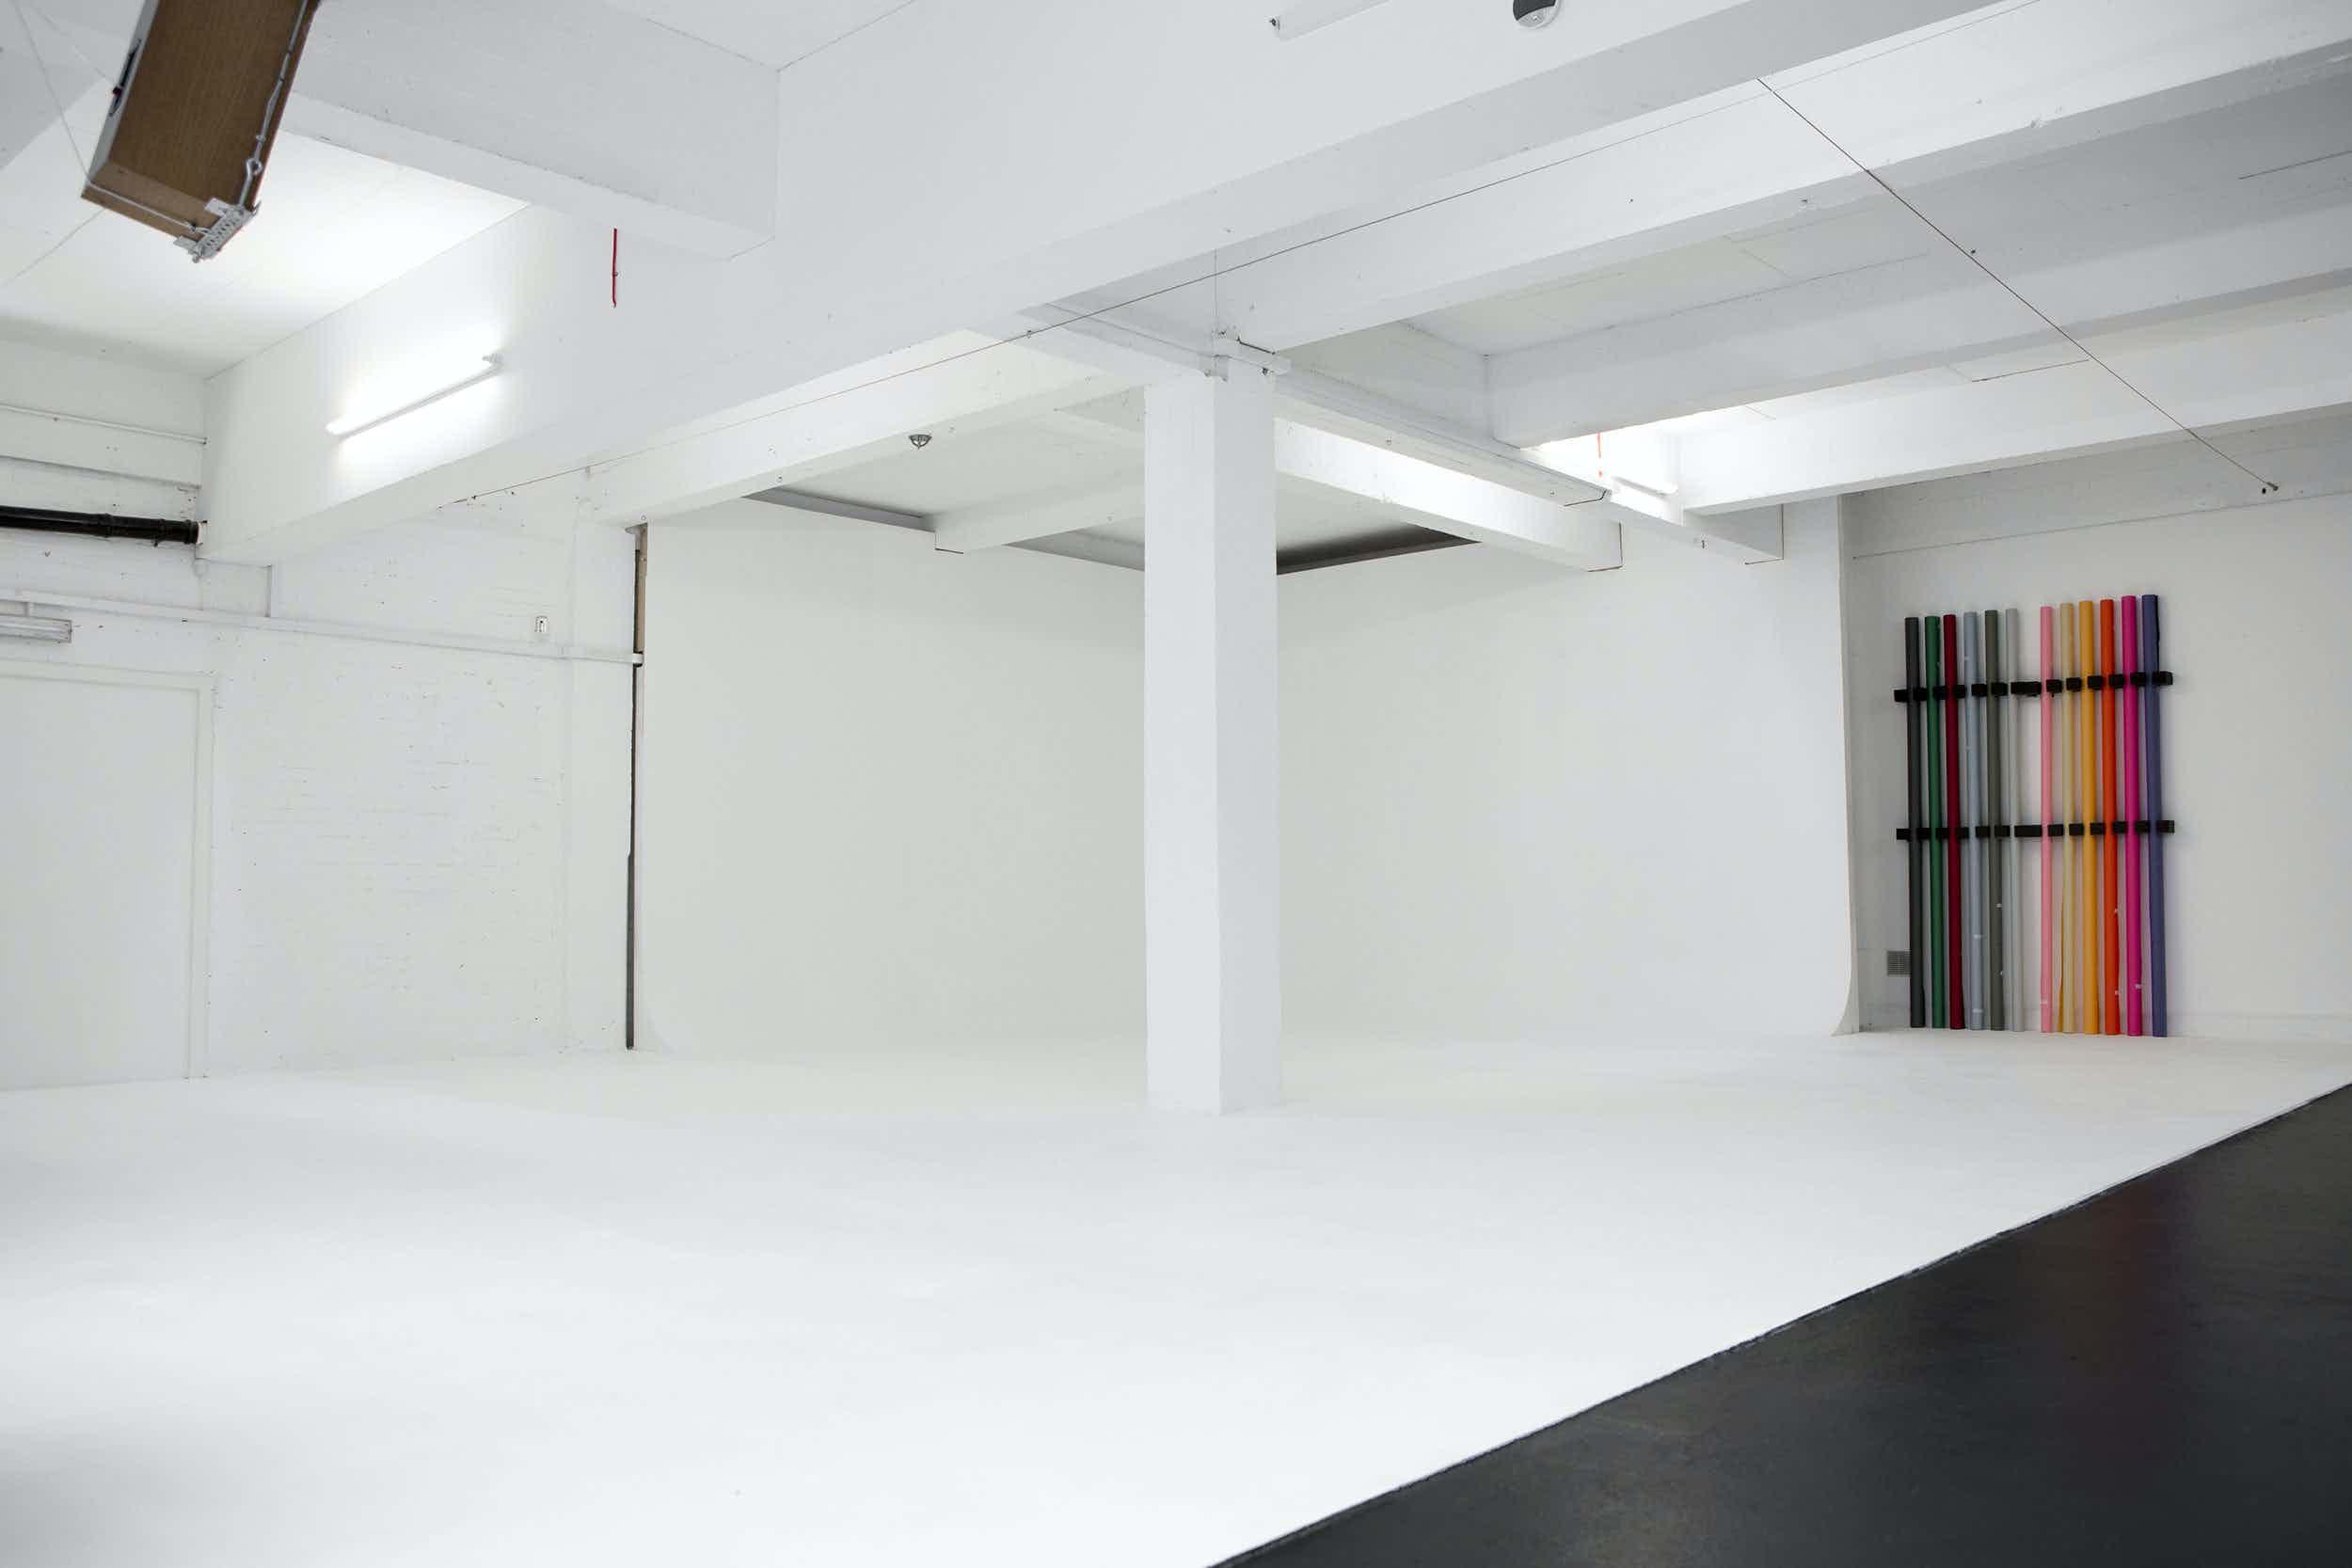 THRDS Studio, THRDS Studio